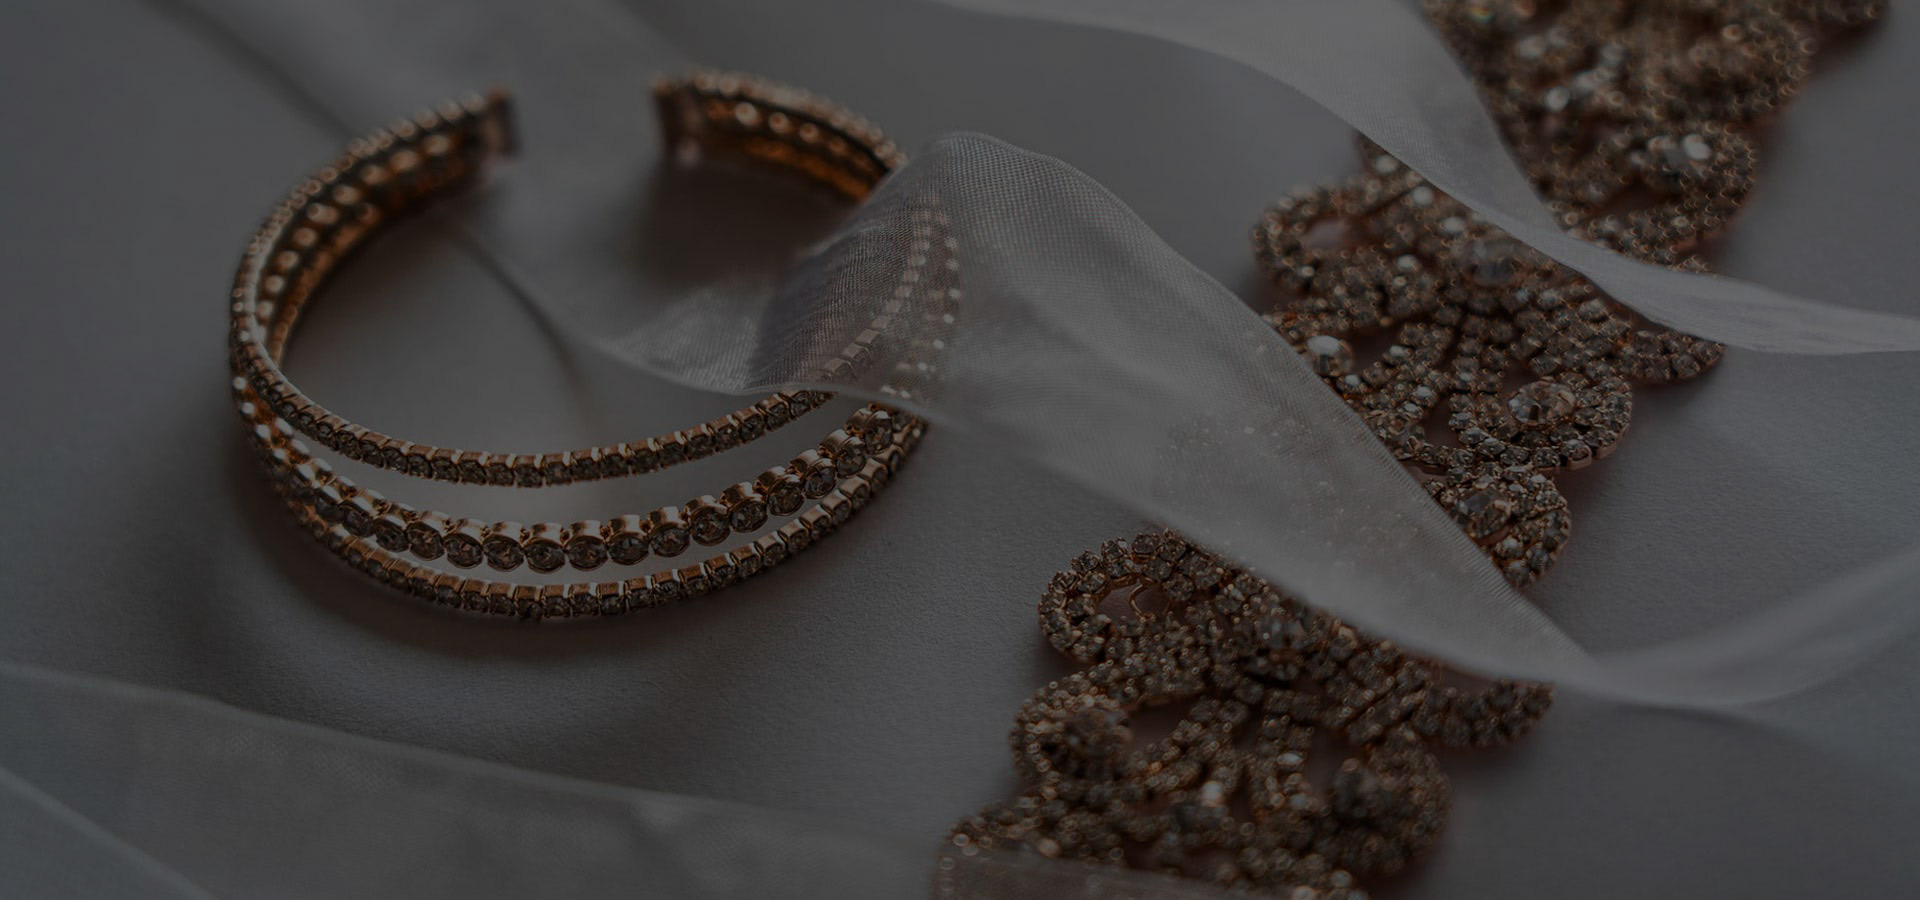 Diamond Fashionable Jewelry